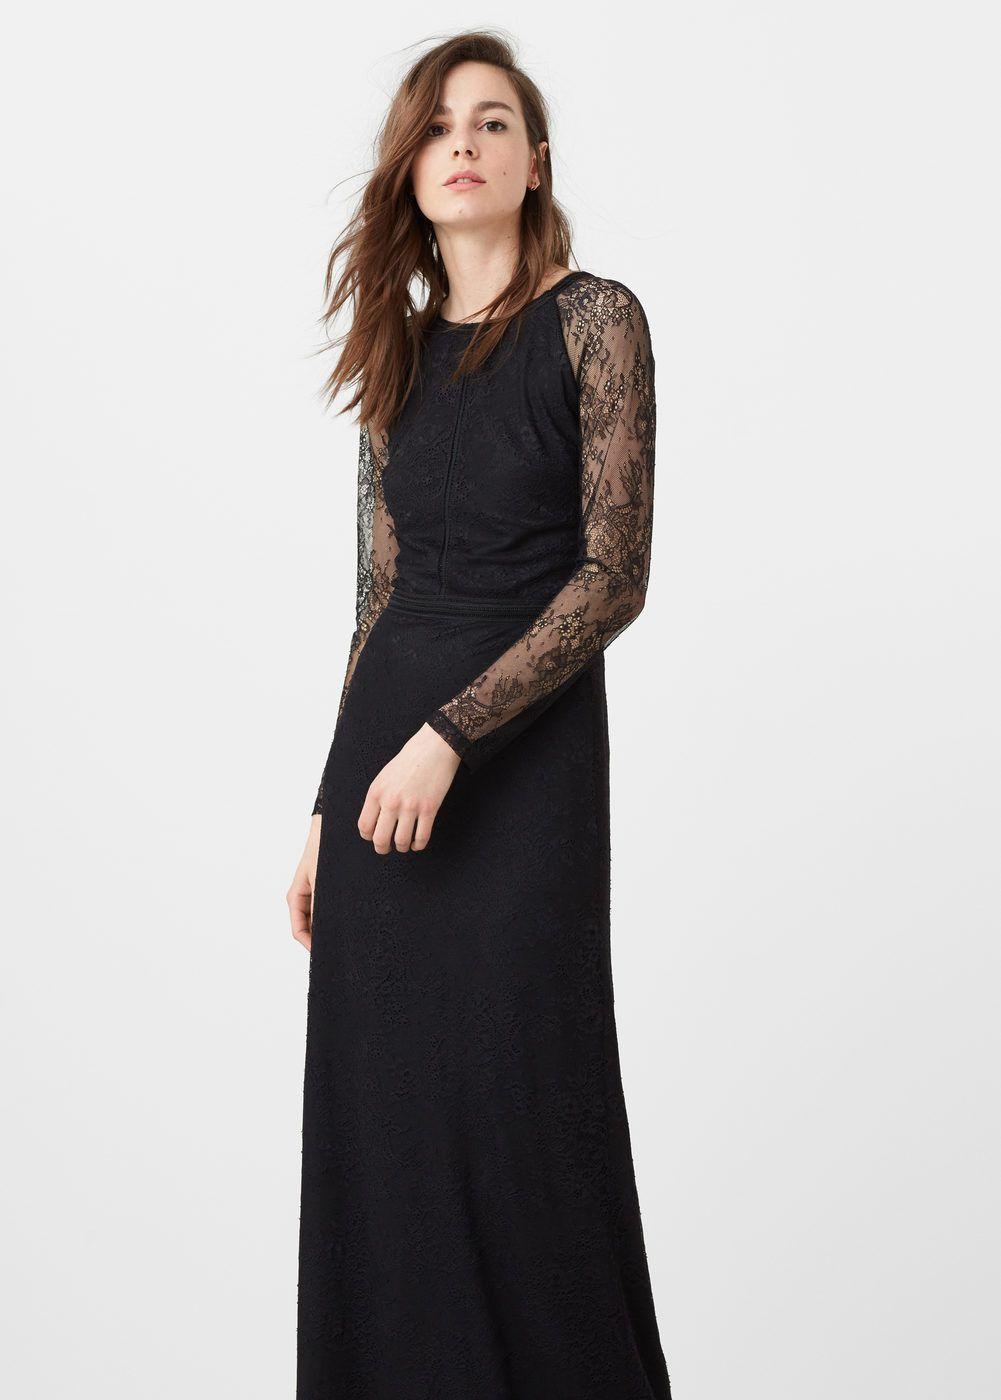 Lace detail gown - Women  Mango United Kingdom  Fashion, Maxi